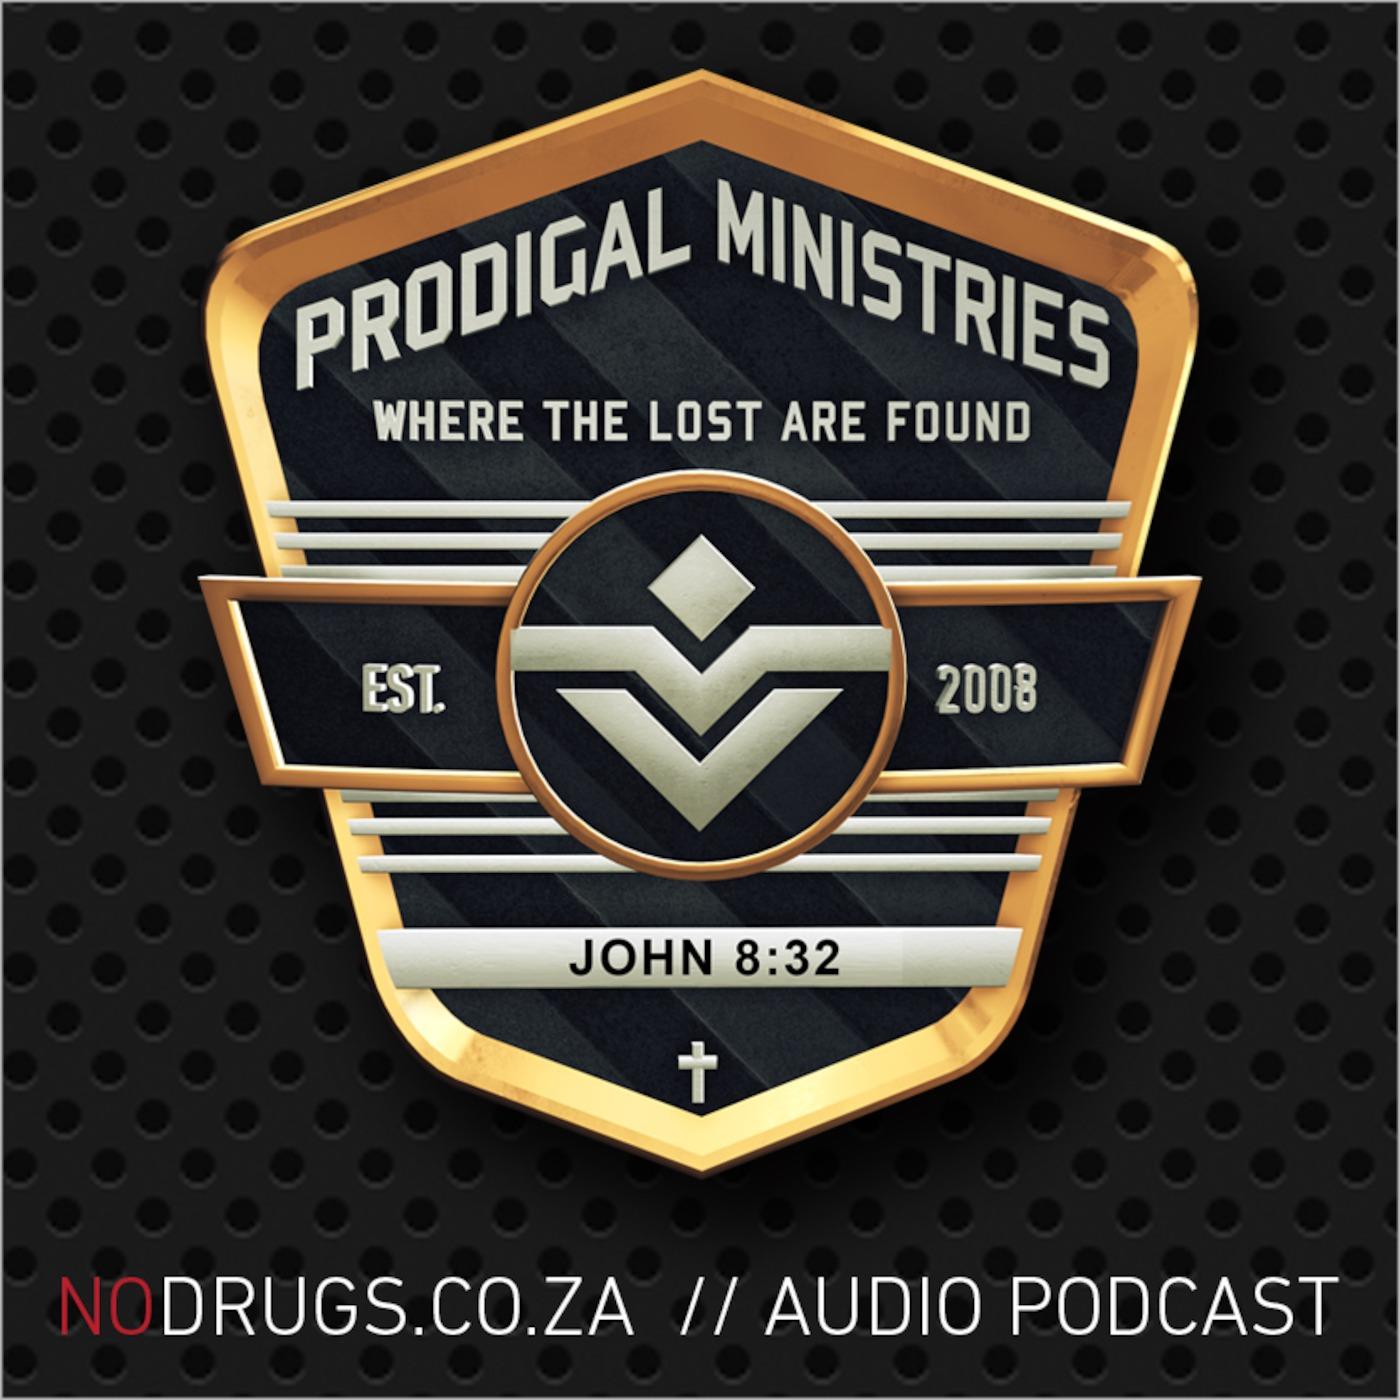 PRODIGAL MINISTRIES